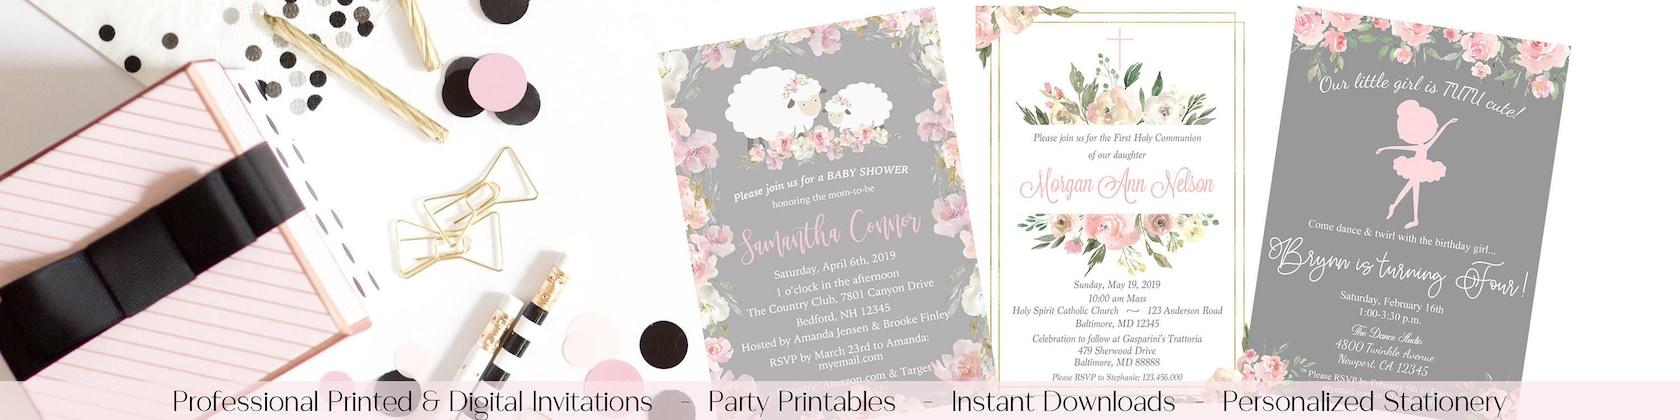 Printed   Digital Invitations   Party Decor di Marbella1Printables 541a589b50c6